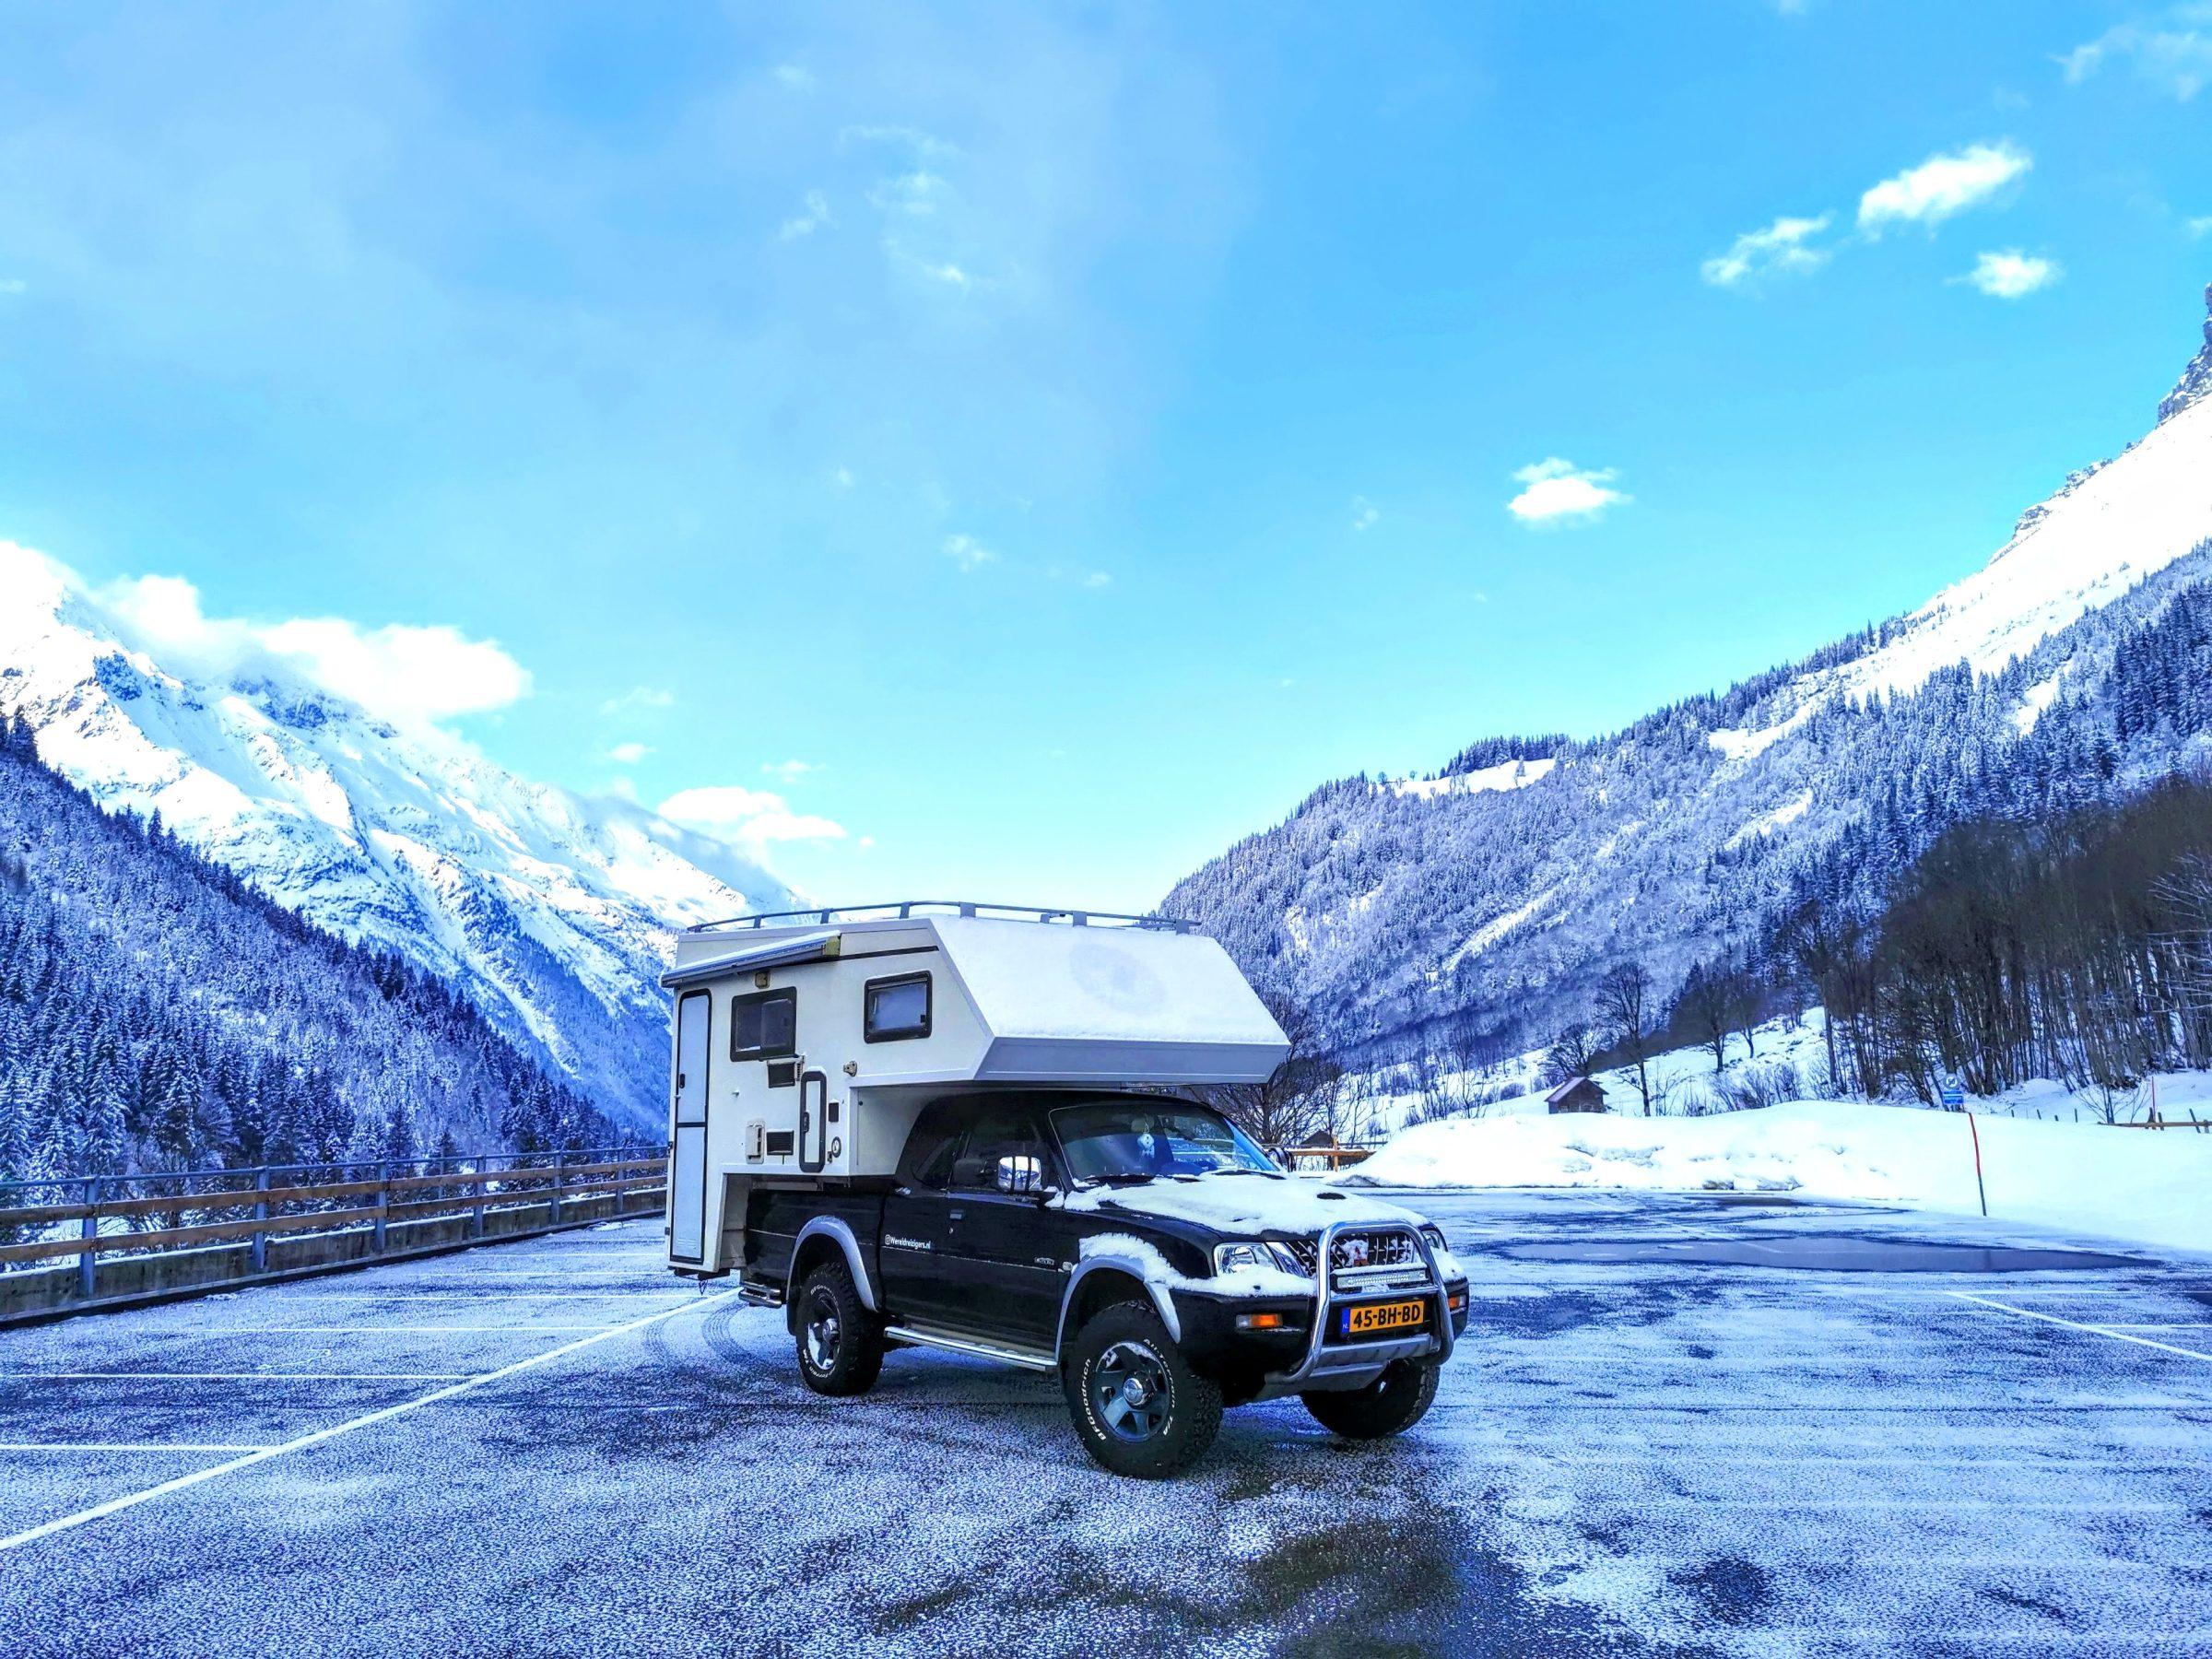 De Wereldreizigers.nl offroad 4x4 camper in Zwitserland | April 2021